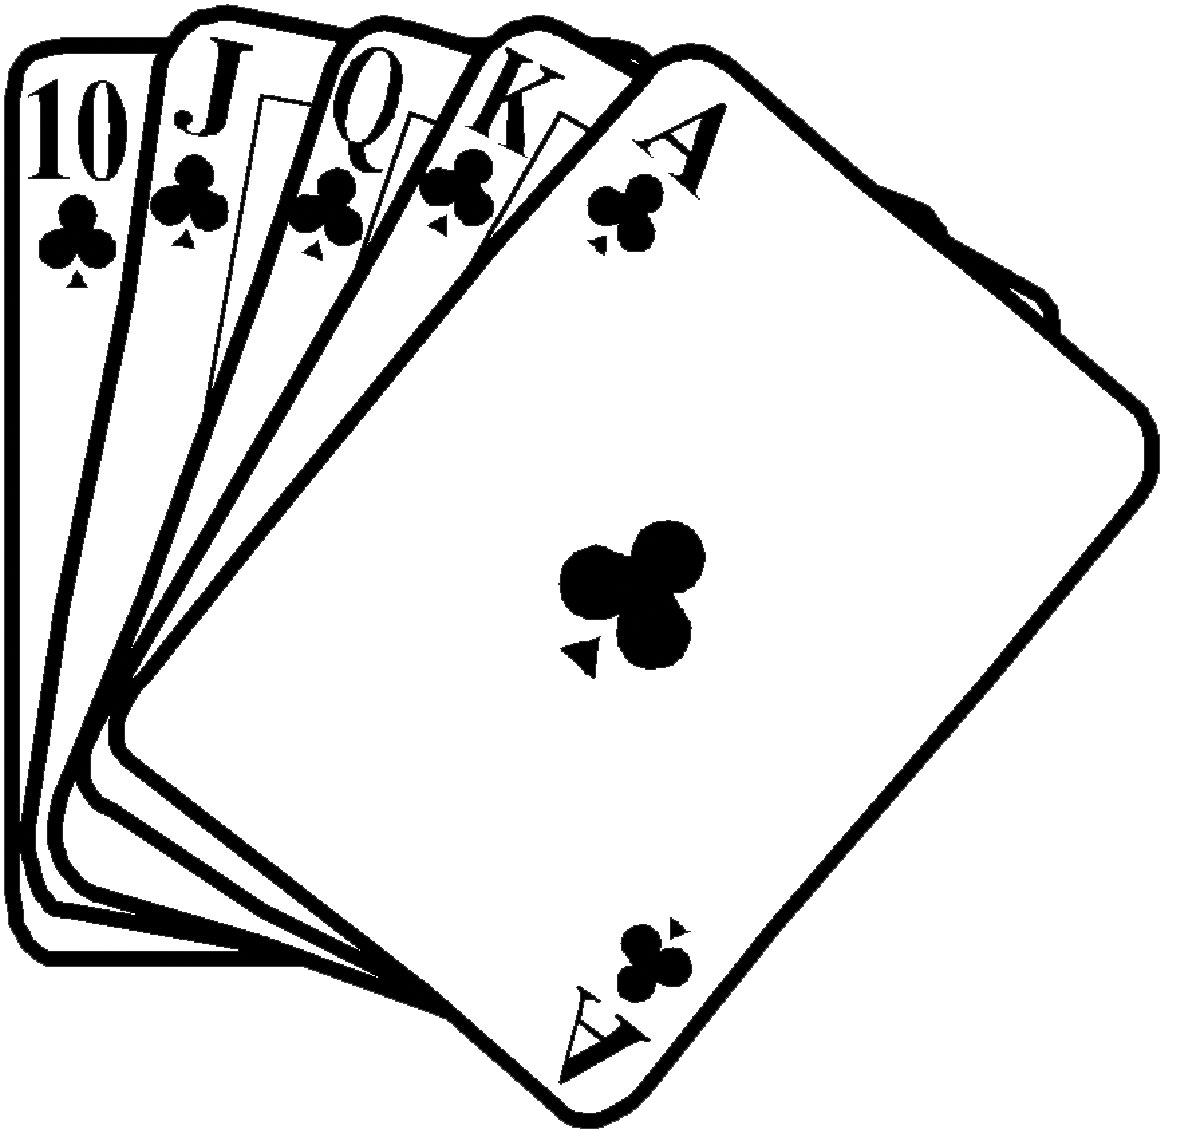 poker-clip-art-y4c9kMpTE.png